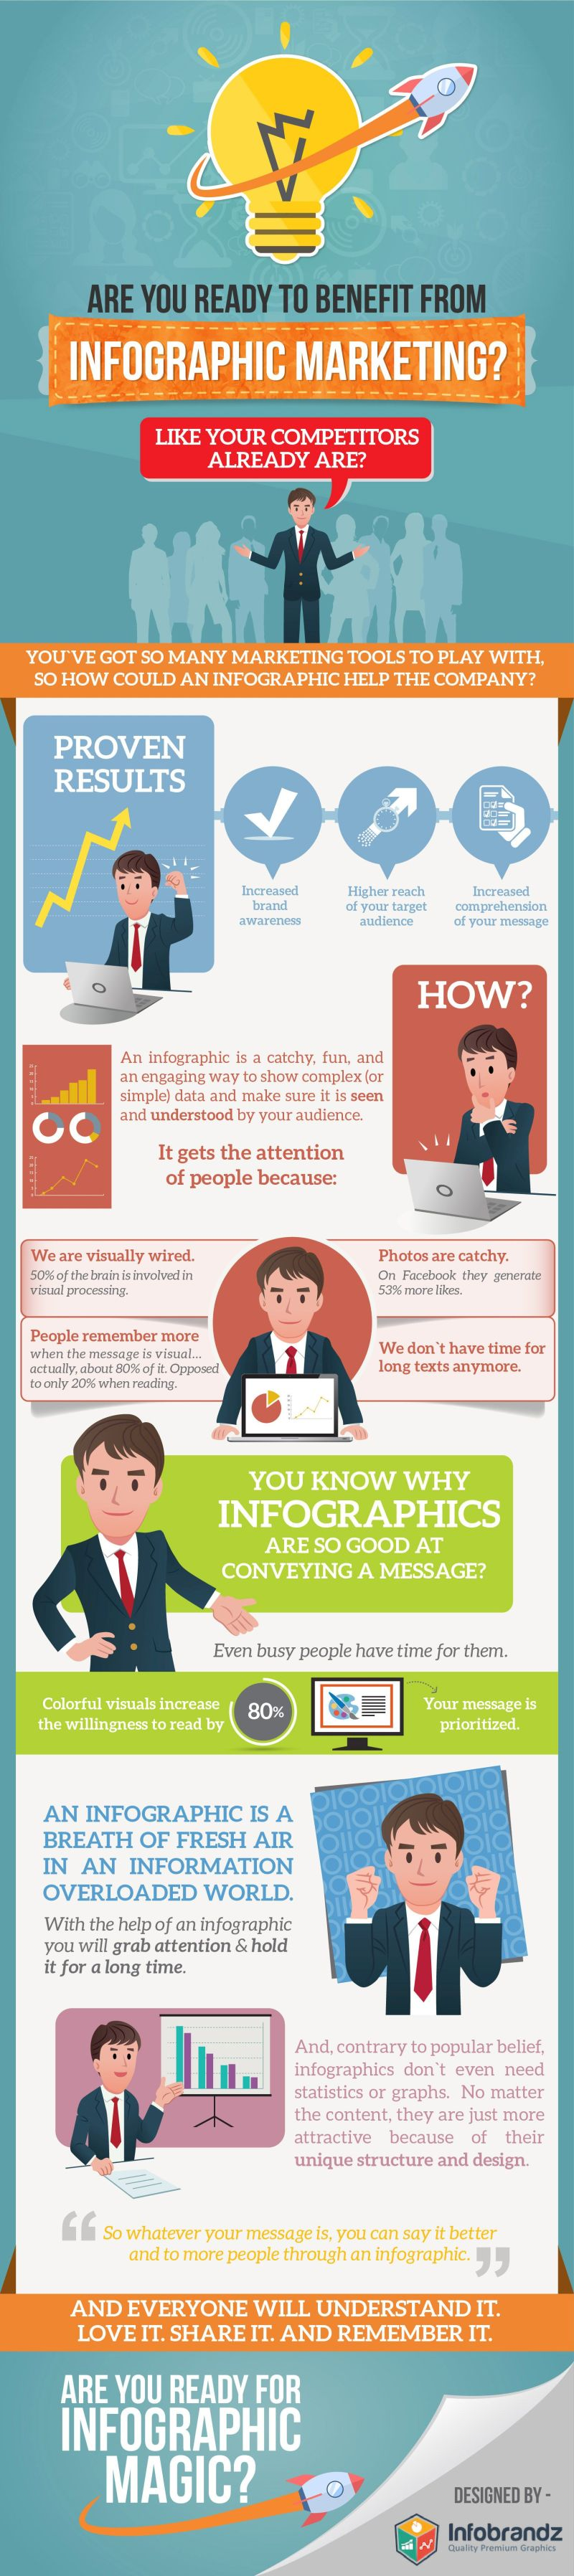 Infographic Marketing Design 01